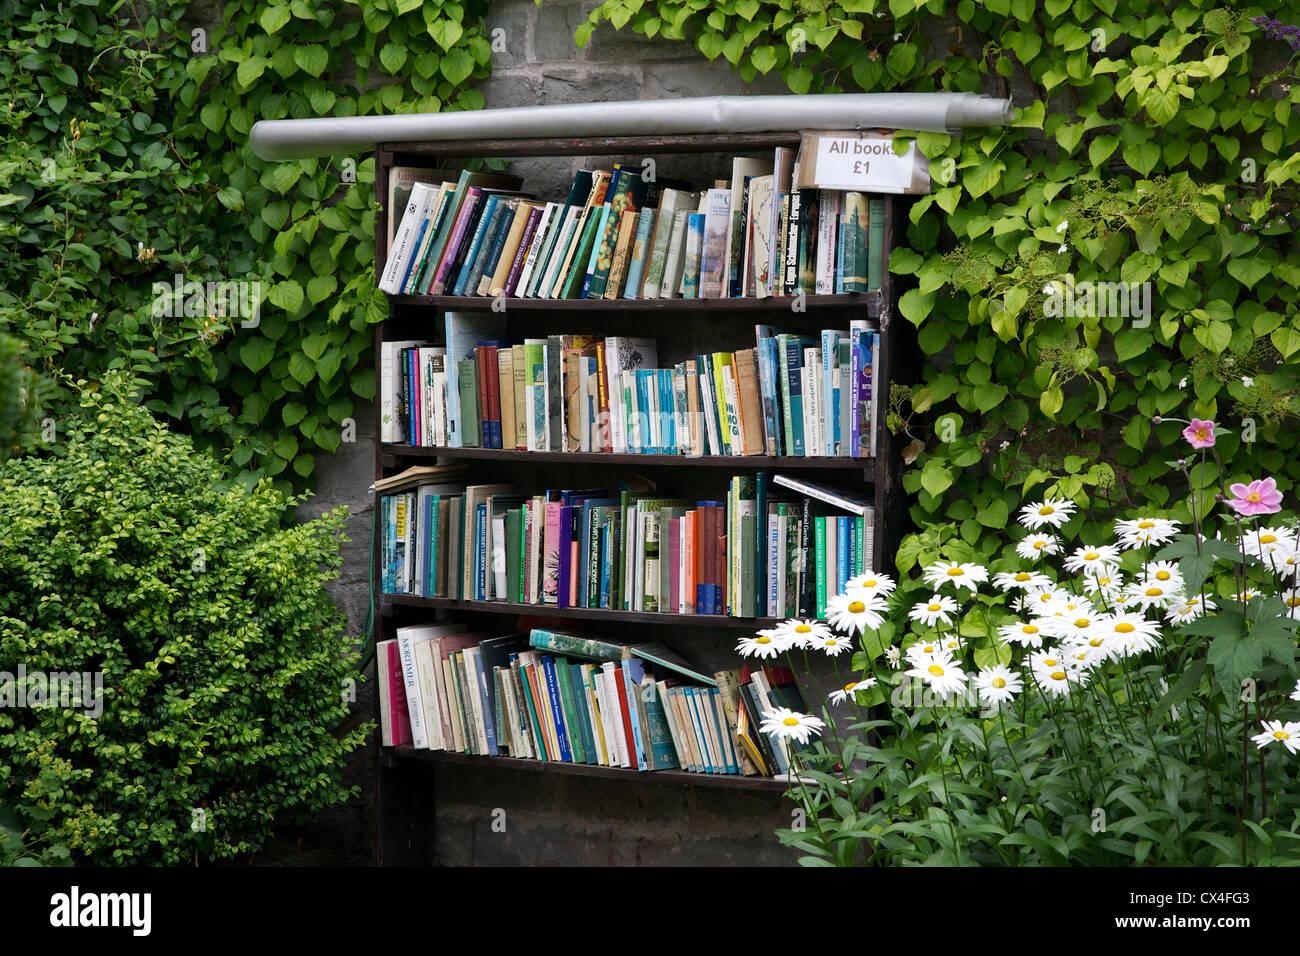 Outdoor bookshelf and honesty box, Hay on Wye, Powys, Wales, UK - Stock Image